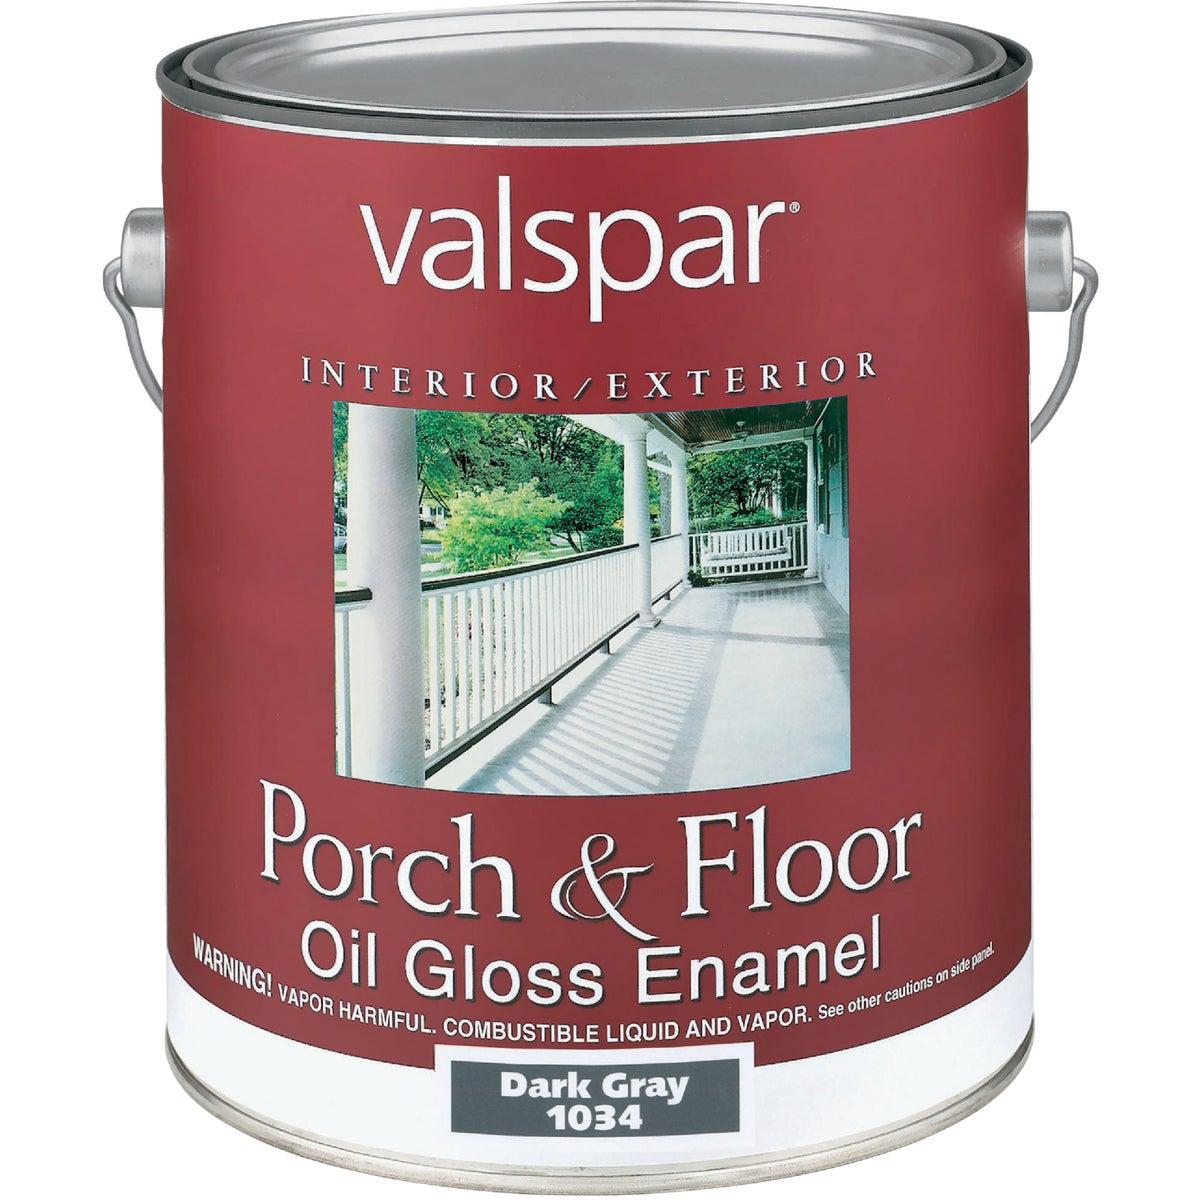 DK GRAY OIL FLOOR ENAMEL - 027.0001034.007 by Valspar Corp